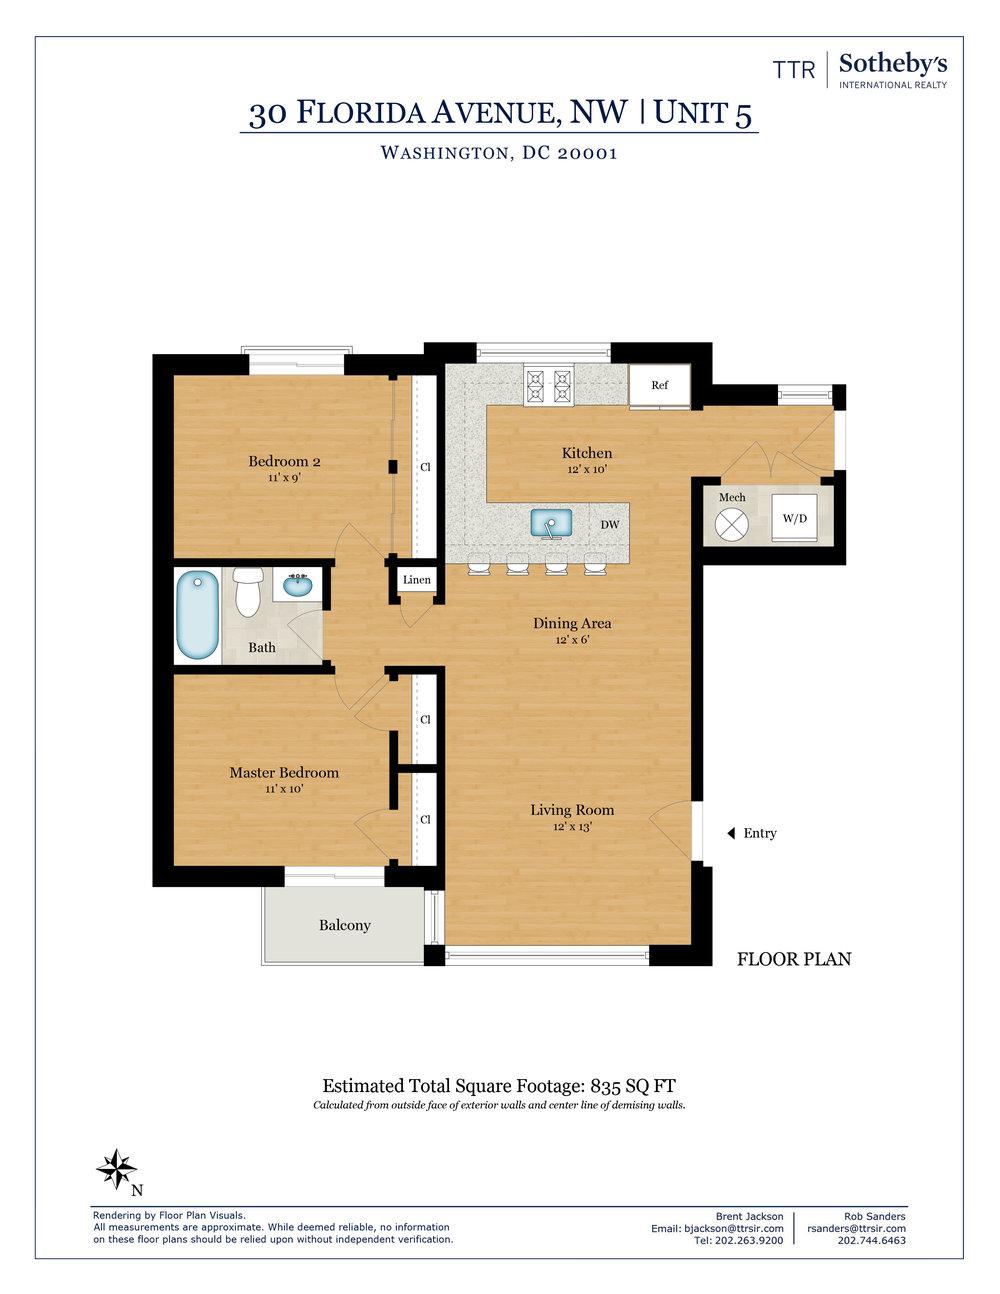 BJ-30FloridaAveNW#5-FloorPlan-Print-R1.jpg